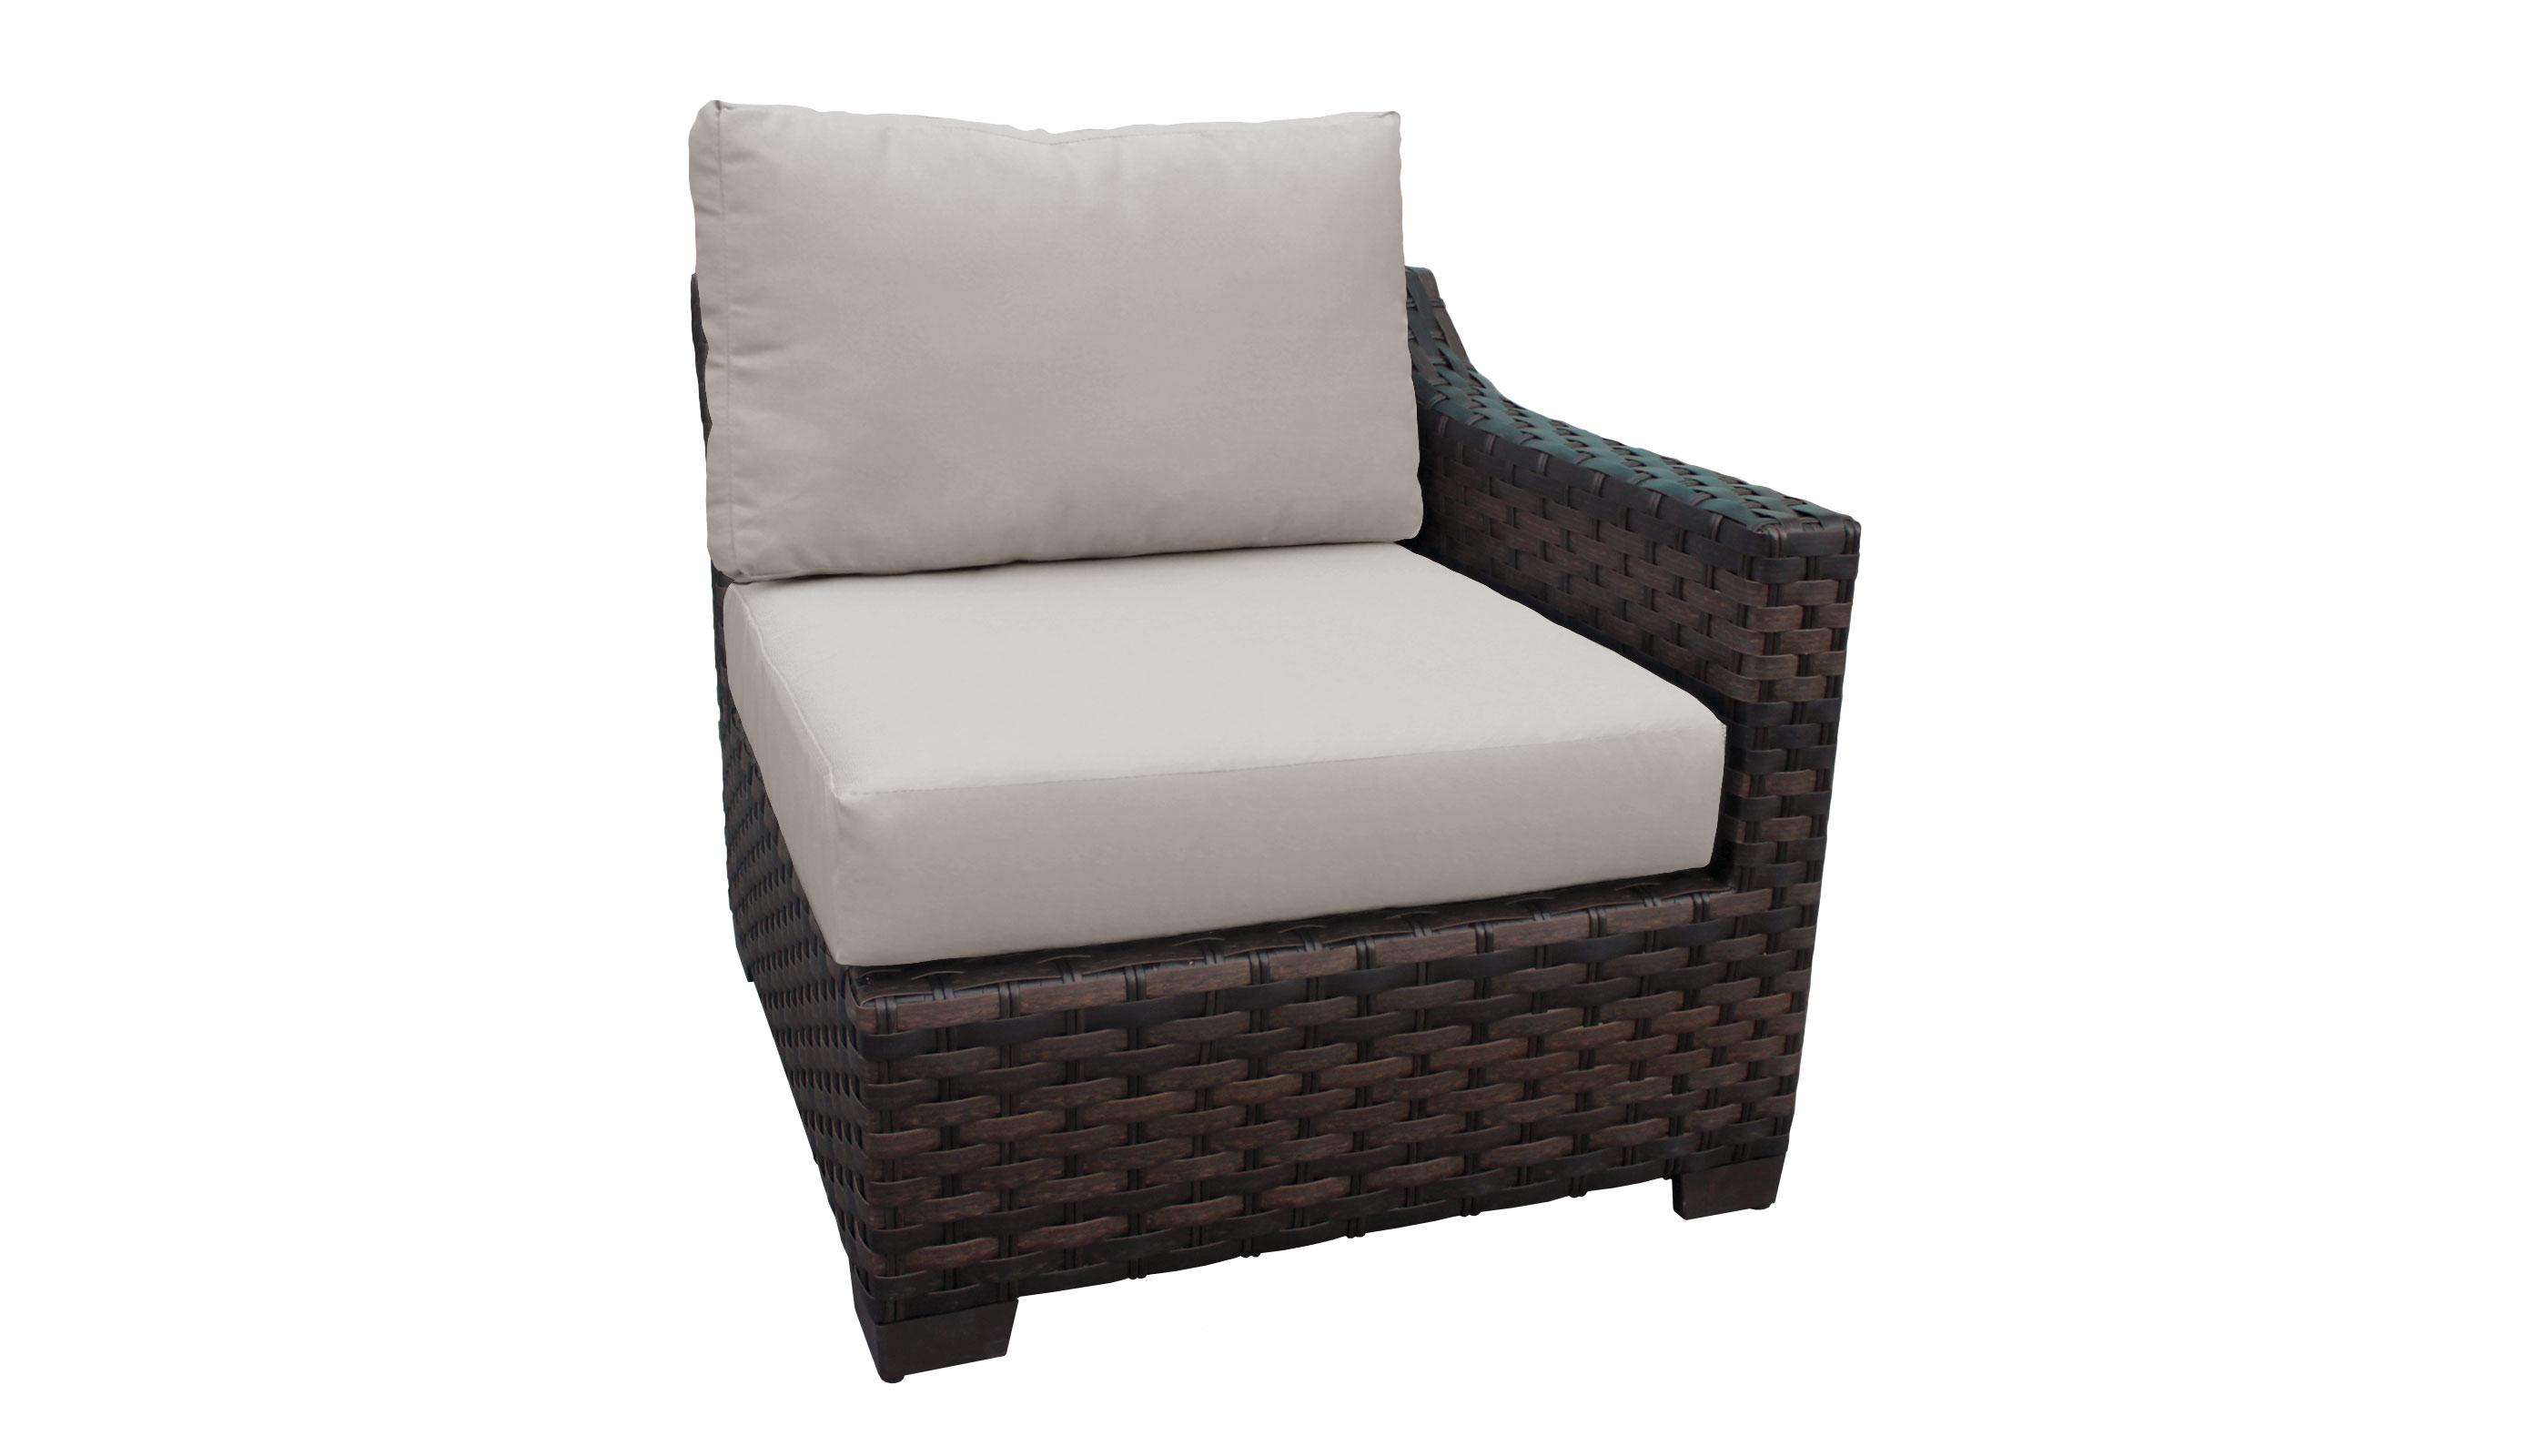 kathy ireland River Brook 5 Piece Outdoor Wicker Patio Furniture Set 05a - TK Classics